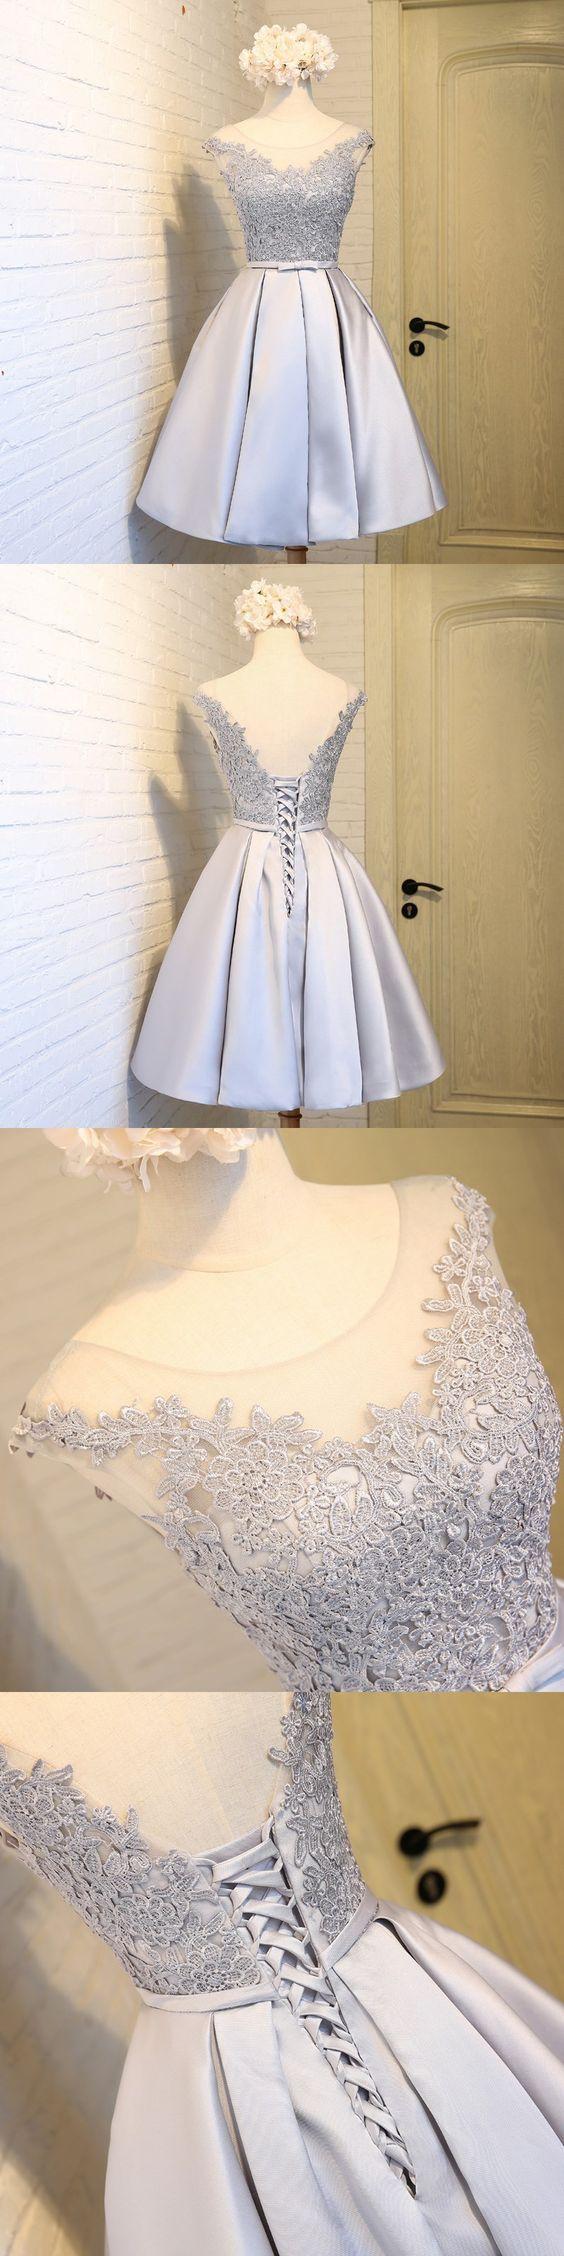 best homecoming dress images on pinterest graduation dresses